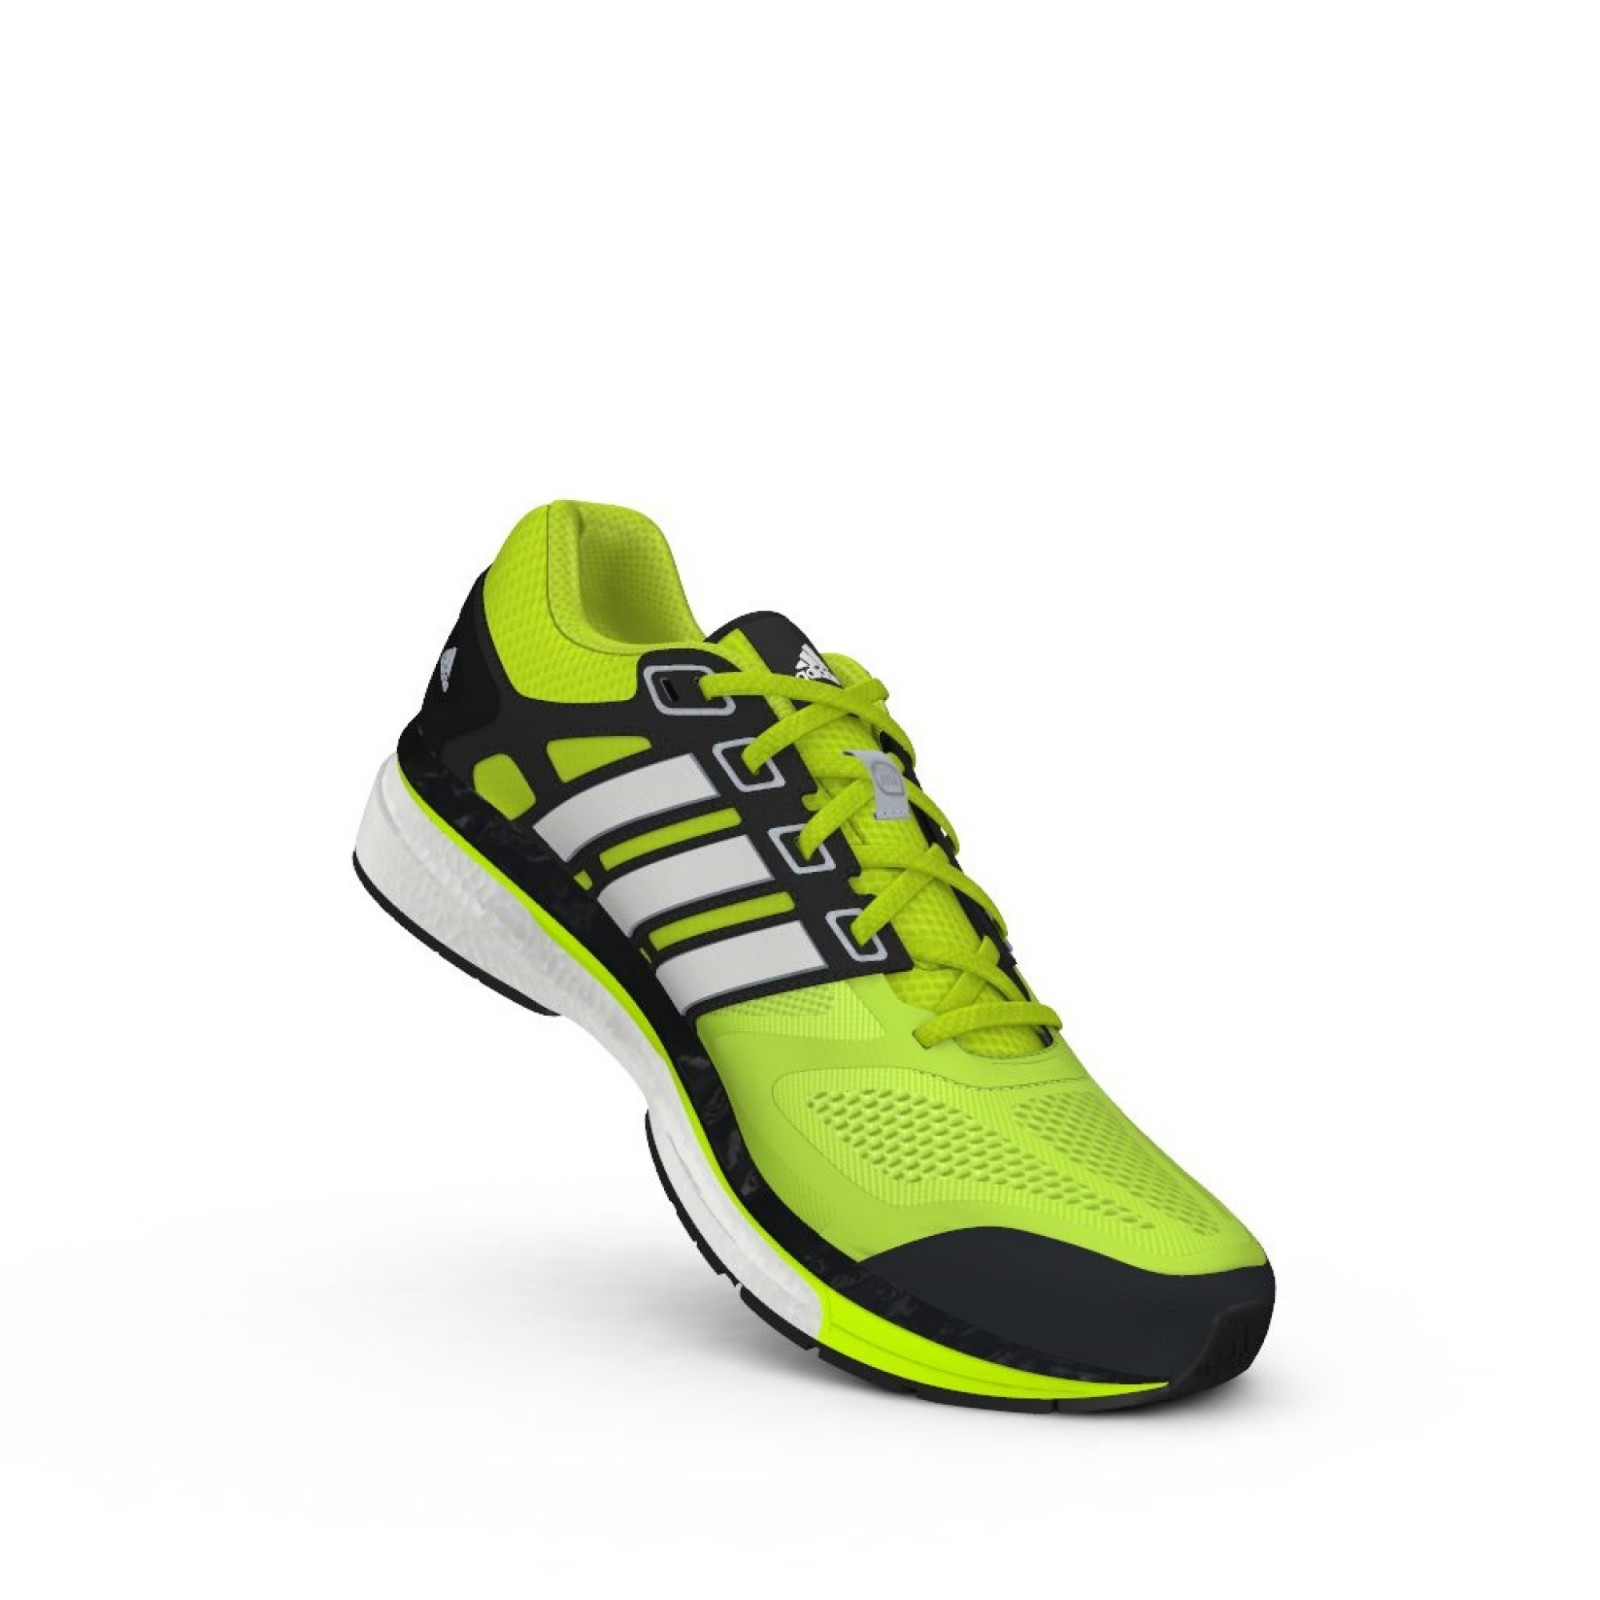 Pánské běžecké boty adidas supernova glide 6 m  7d15f202883